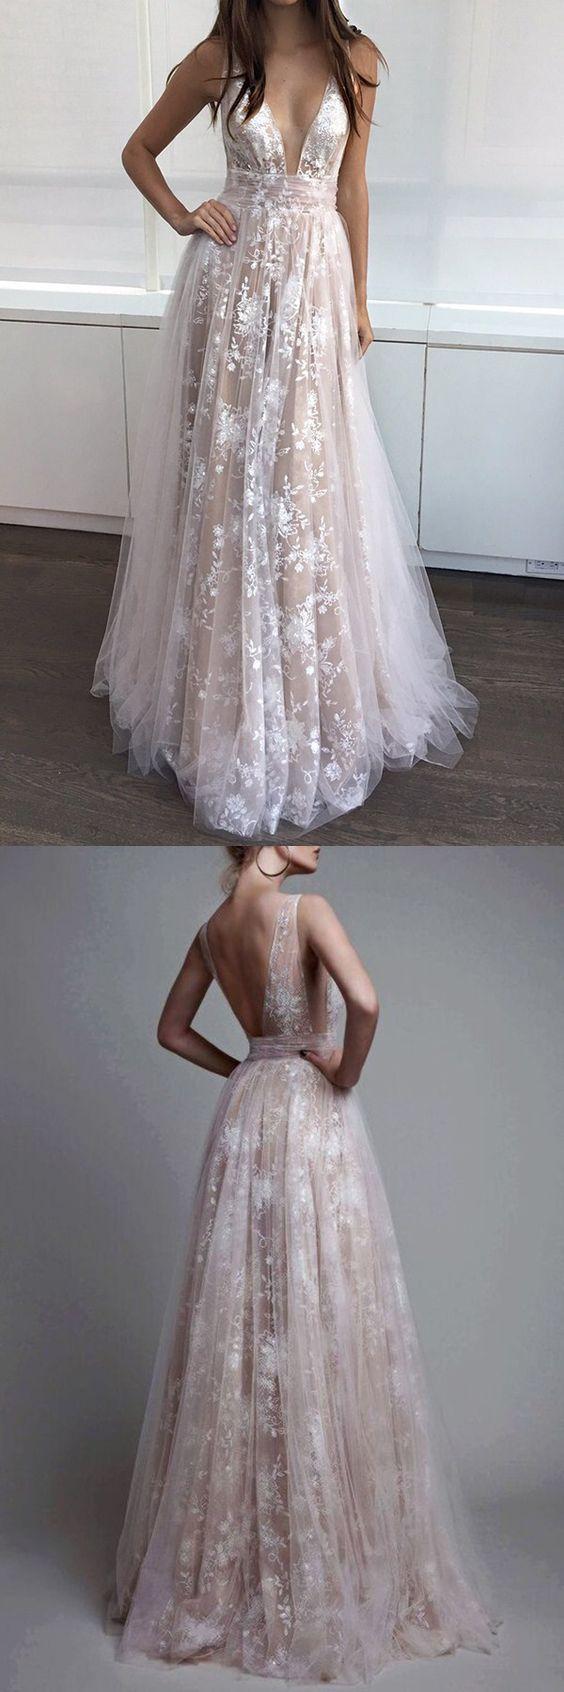 Formal lace prom dresses long prom dress prom dress dresses